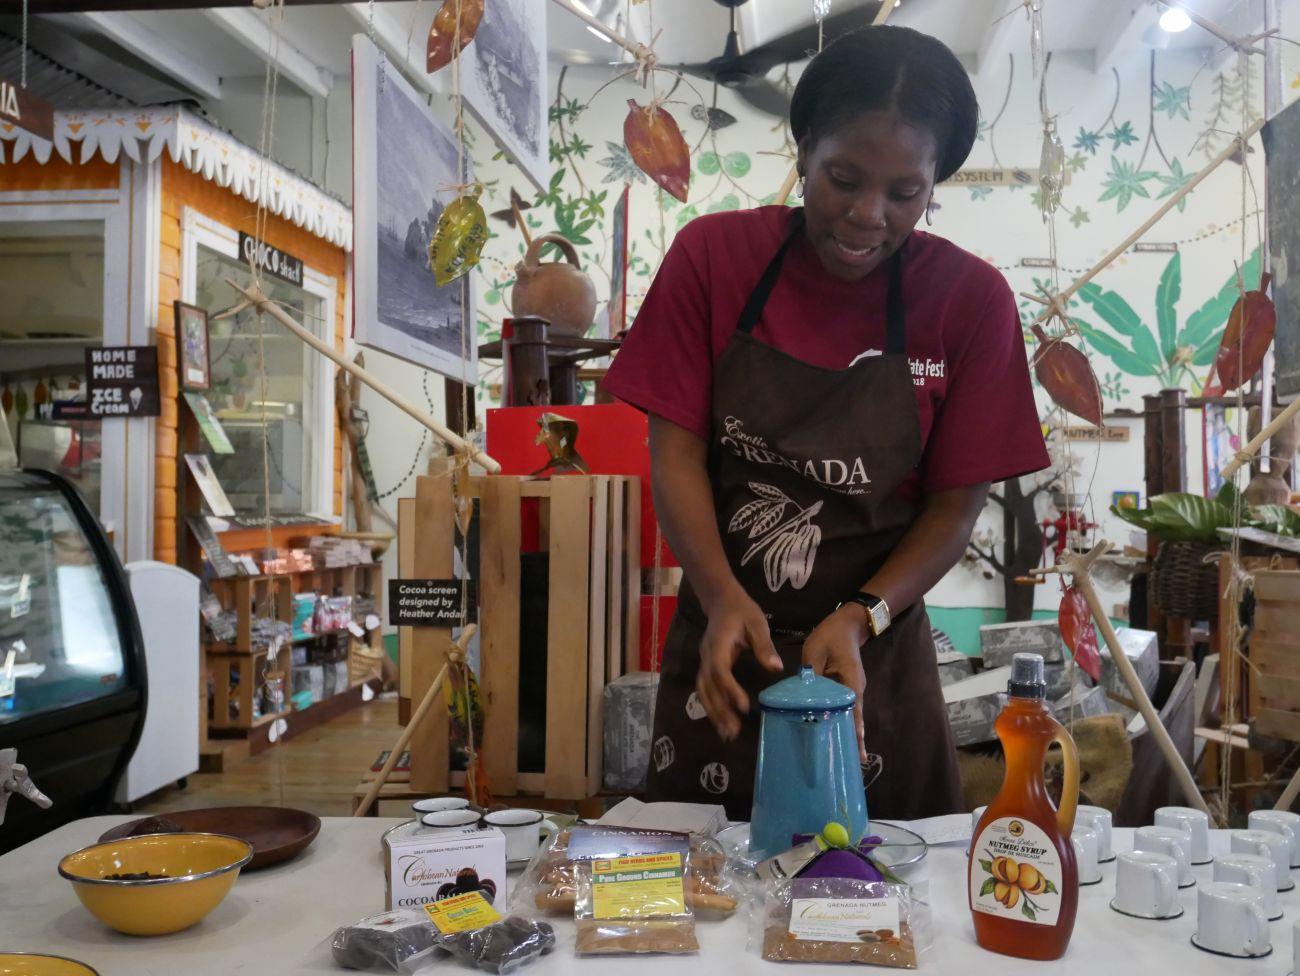 House of Chocolate, Grenada